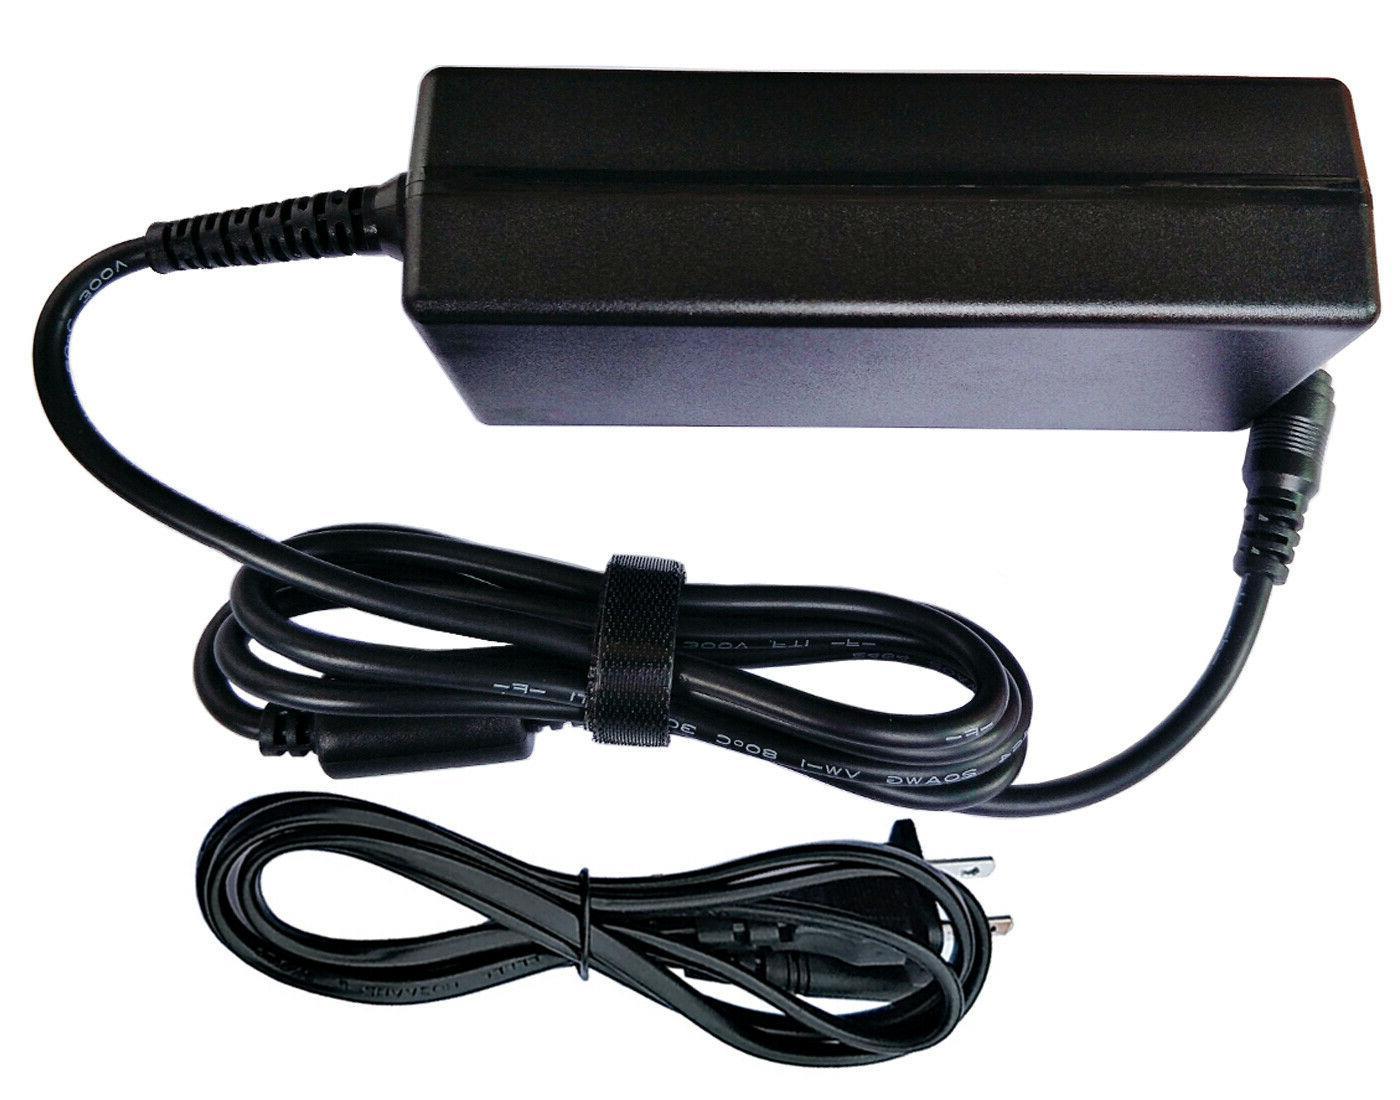 AC CGN-DP Meter Docsis Probe ADS036T-W160200